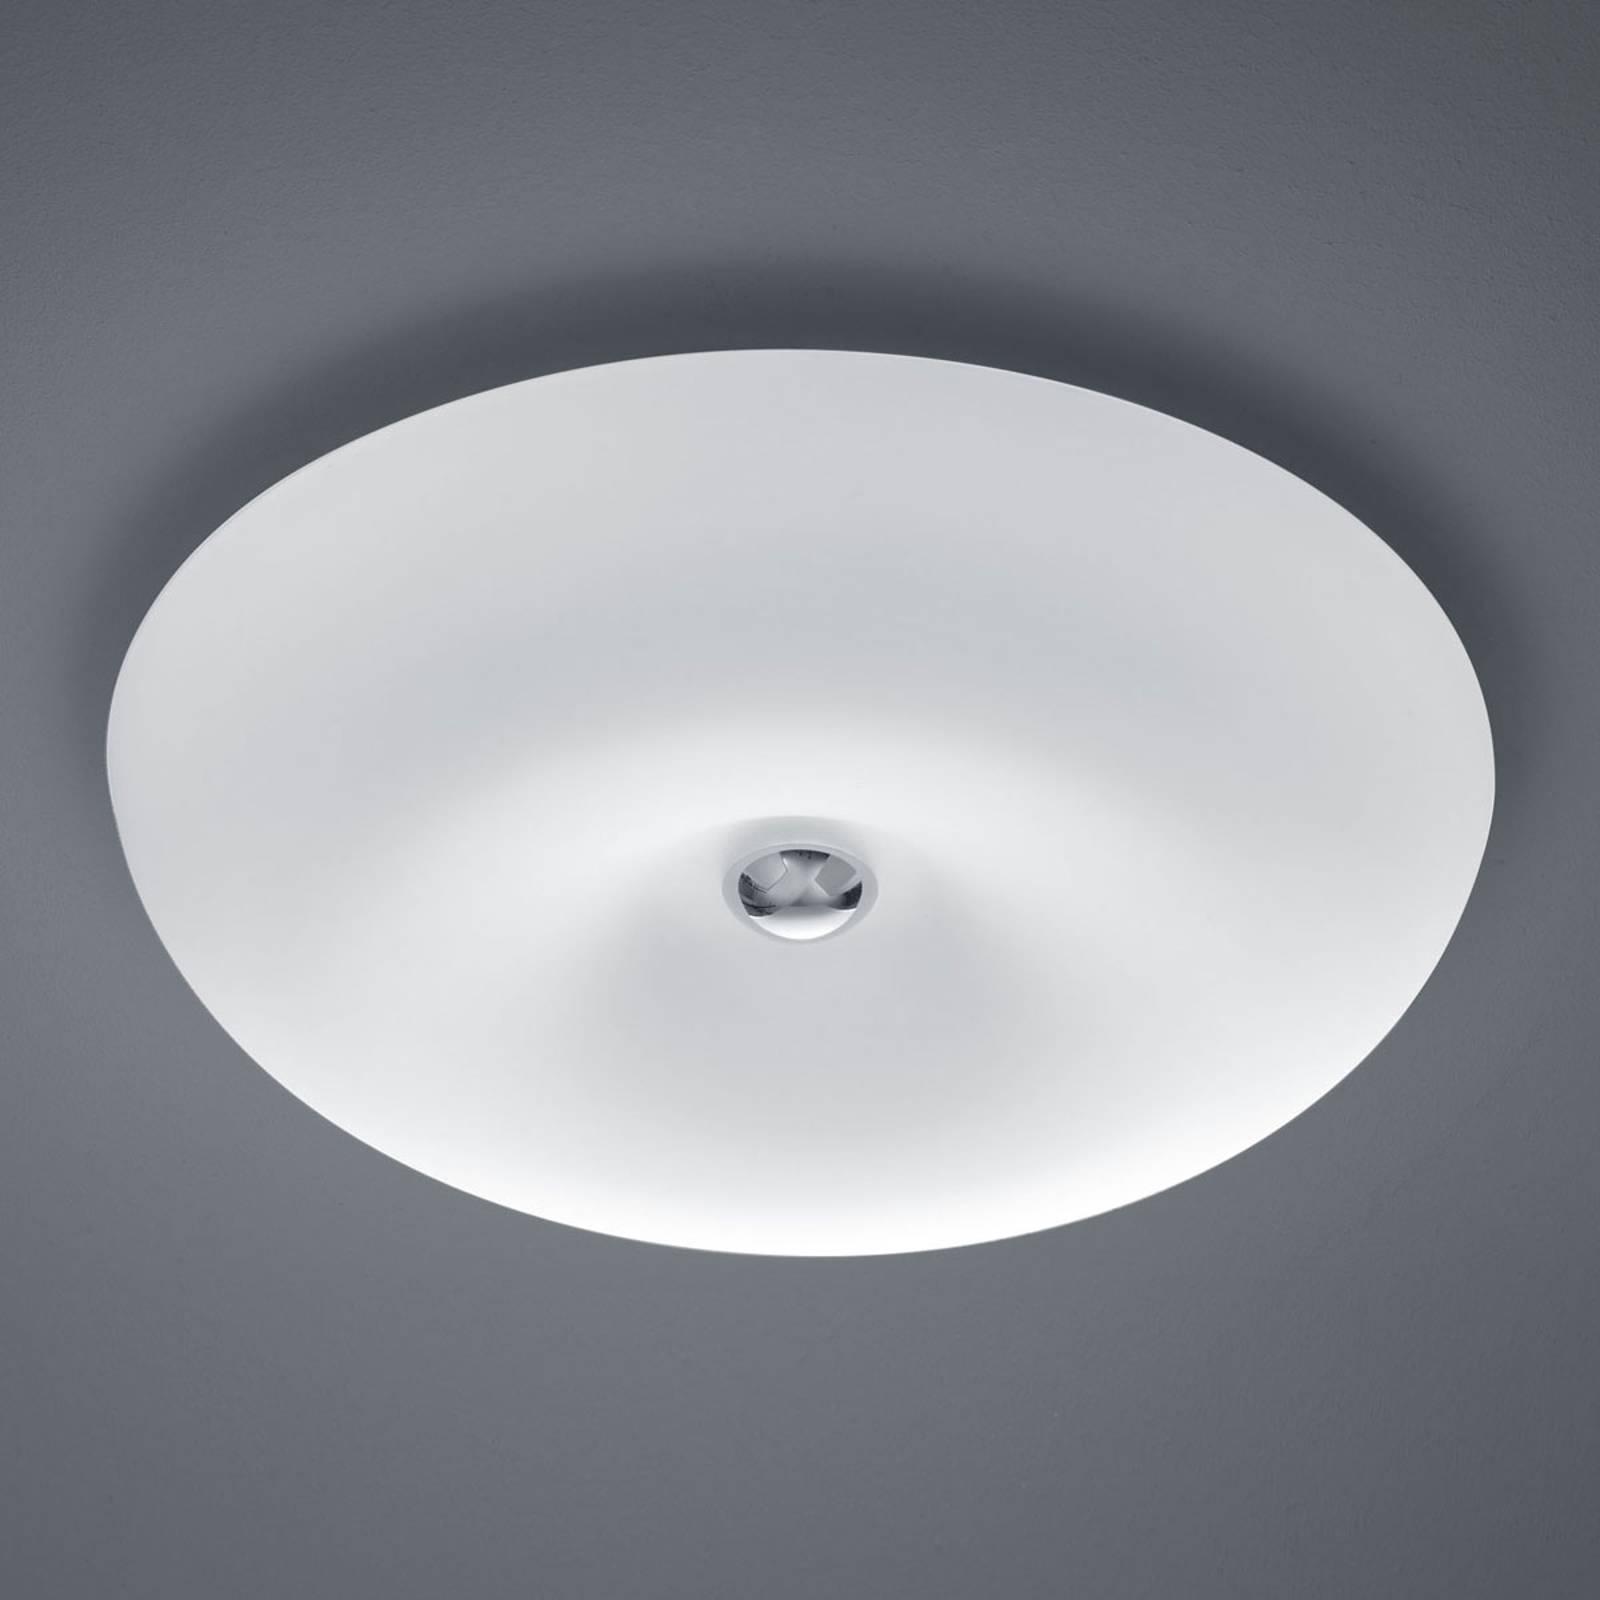 BANKAMP Vanity glas-plafondlamp LED, nikkel